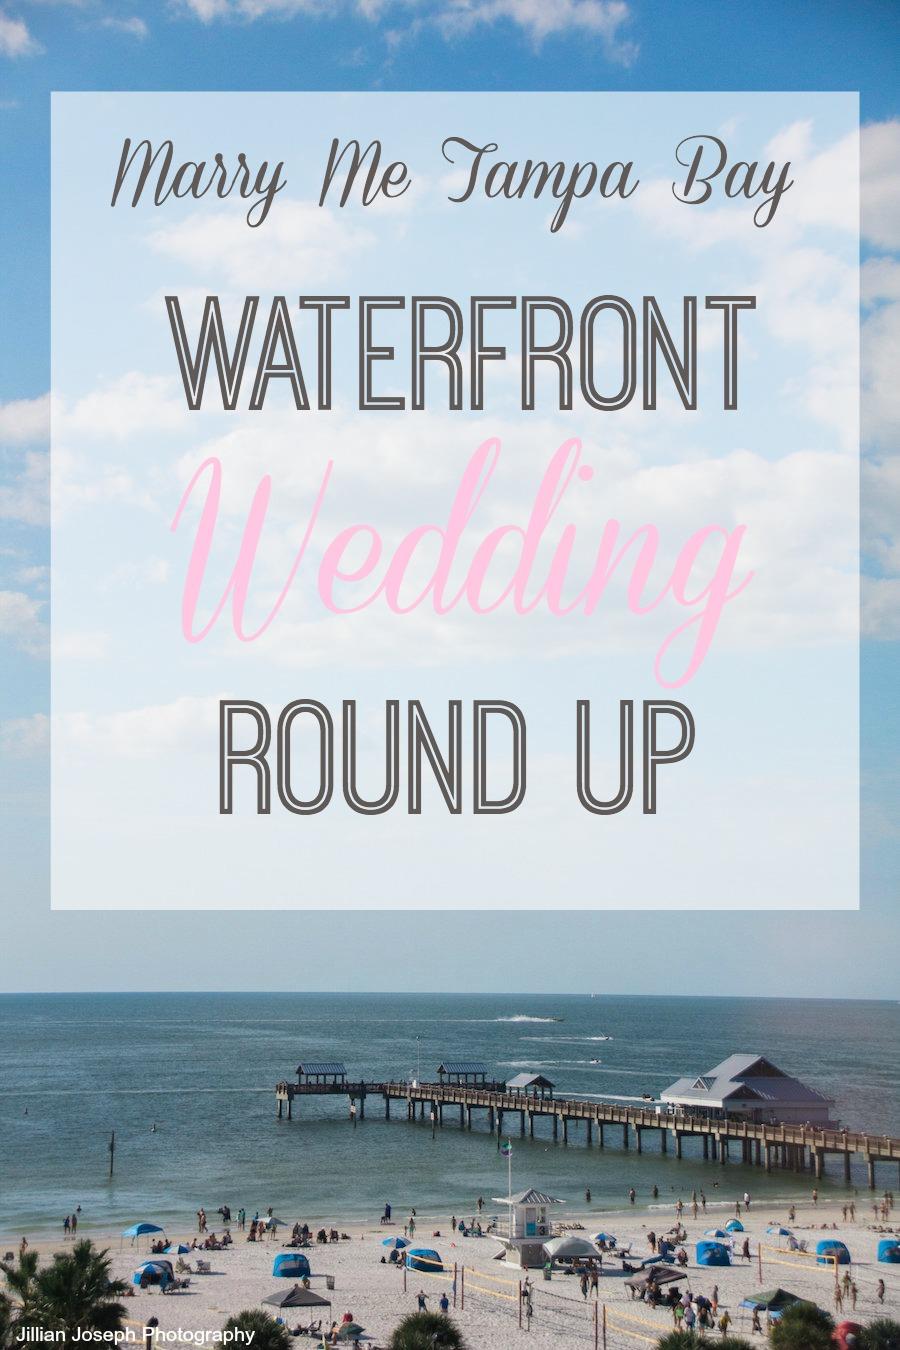 Waterfront Weddings   Tampa Bay Wedding Round Up